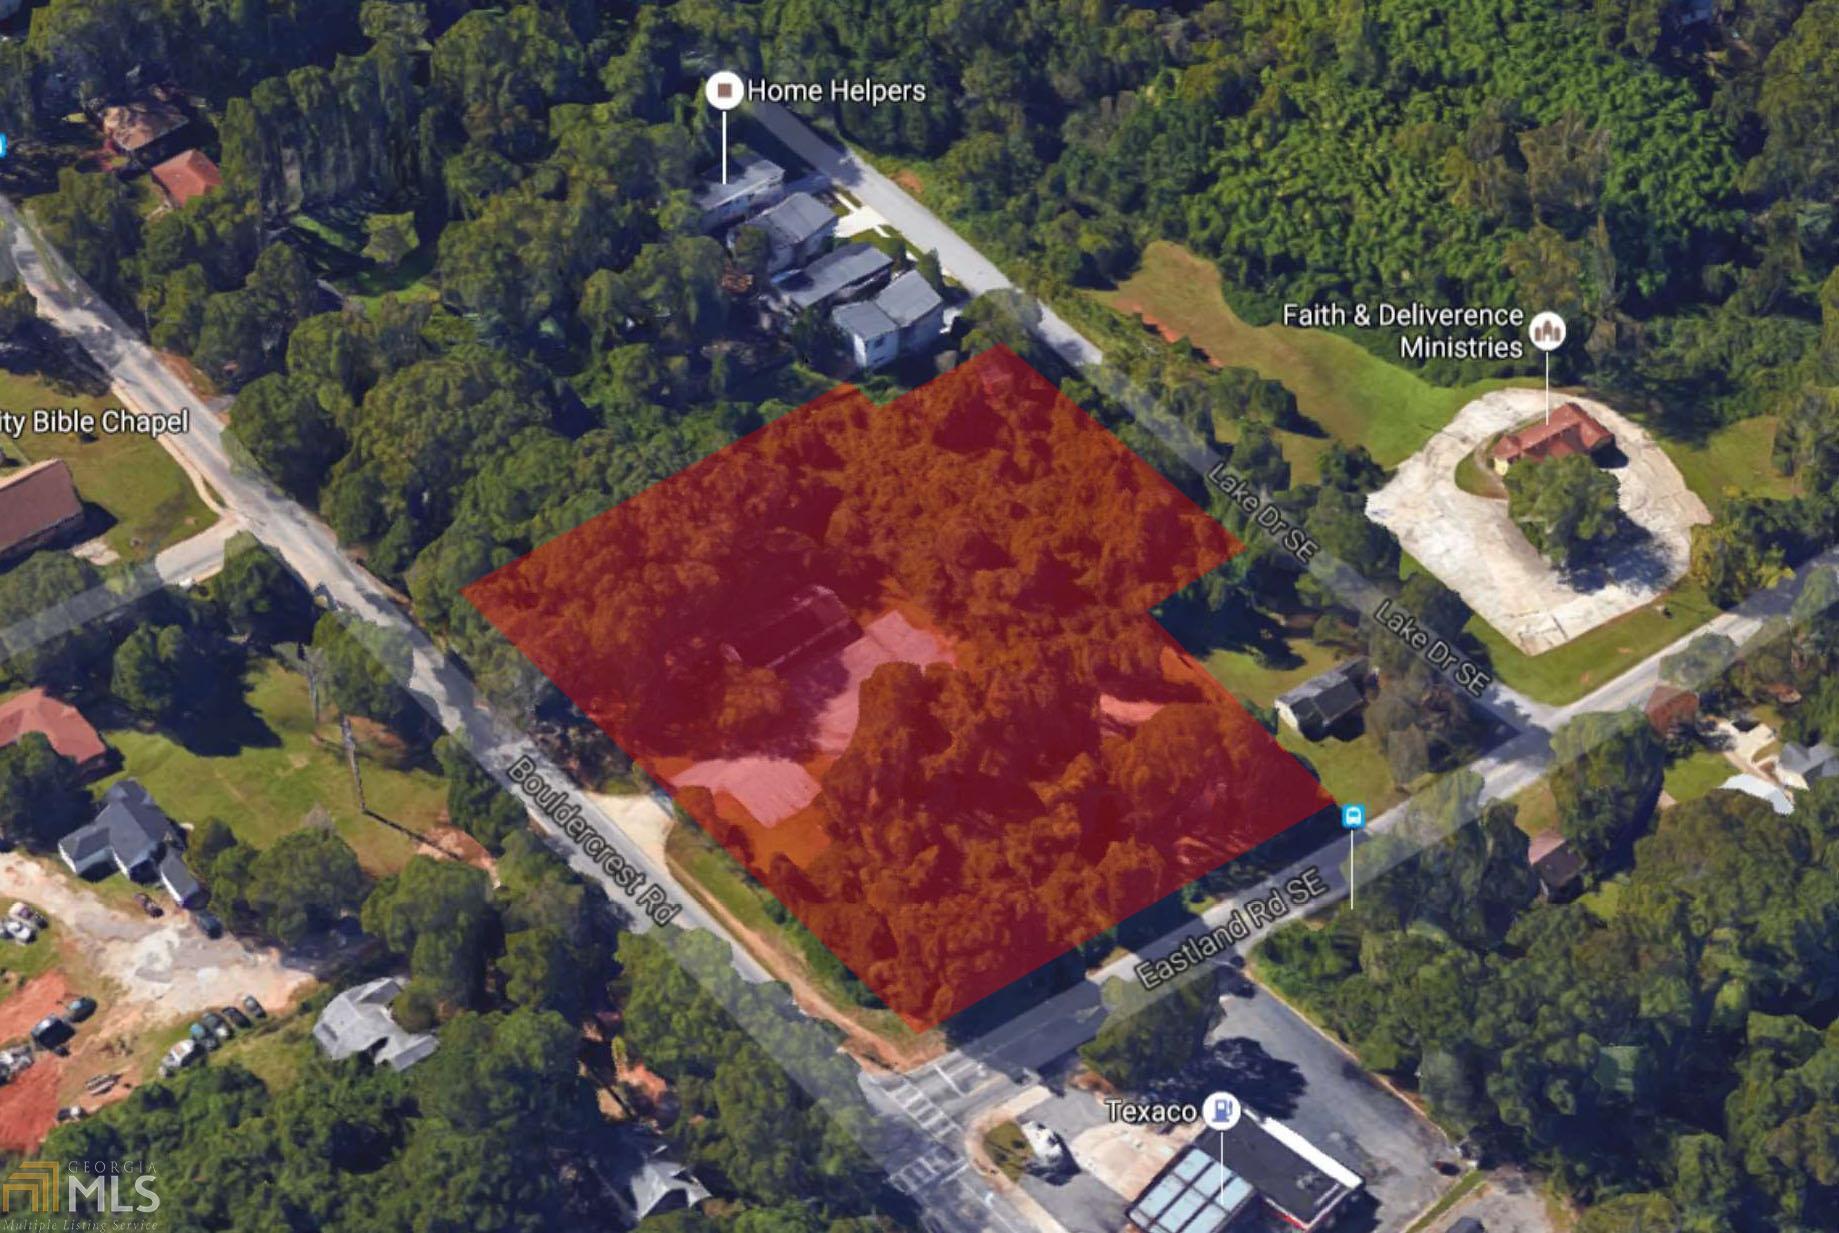 1,482 sq ft Commercial Property in Atlanta for $1,500,000